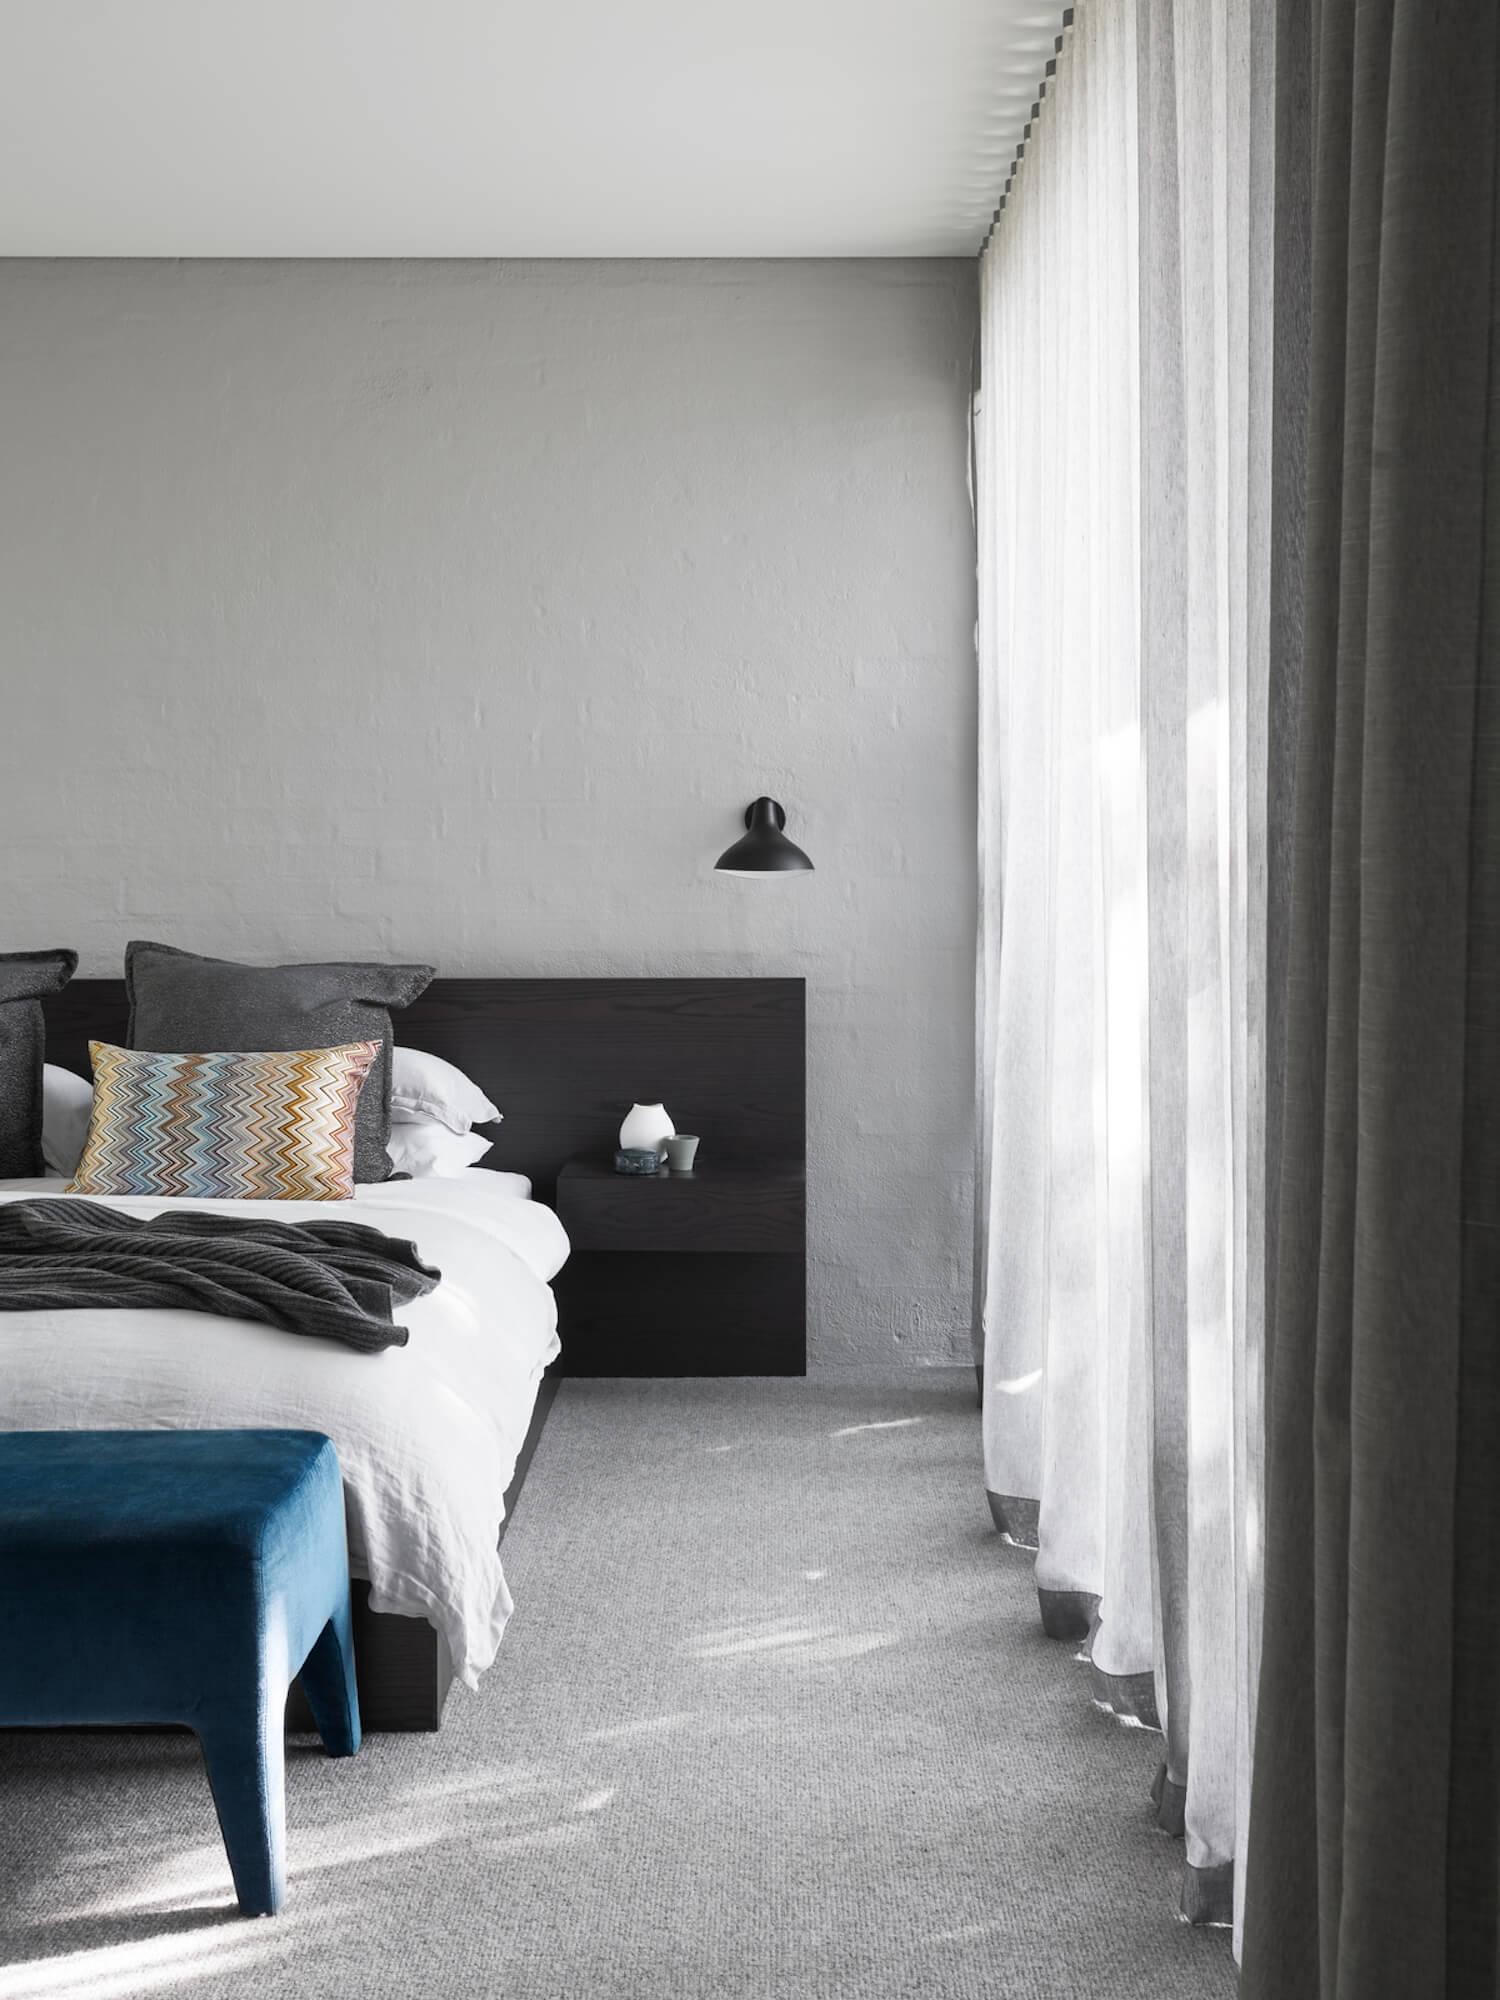 est living malvern east house pleysier perkins bedroom 6